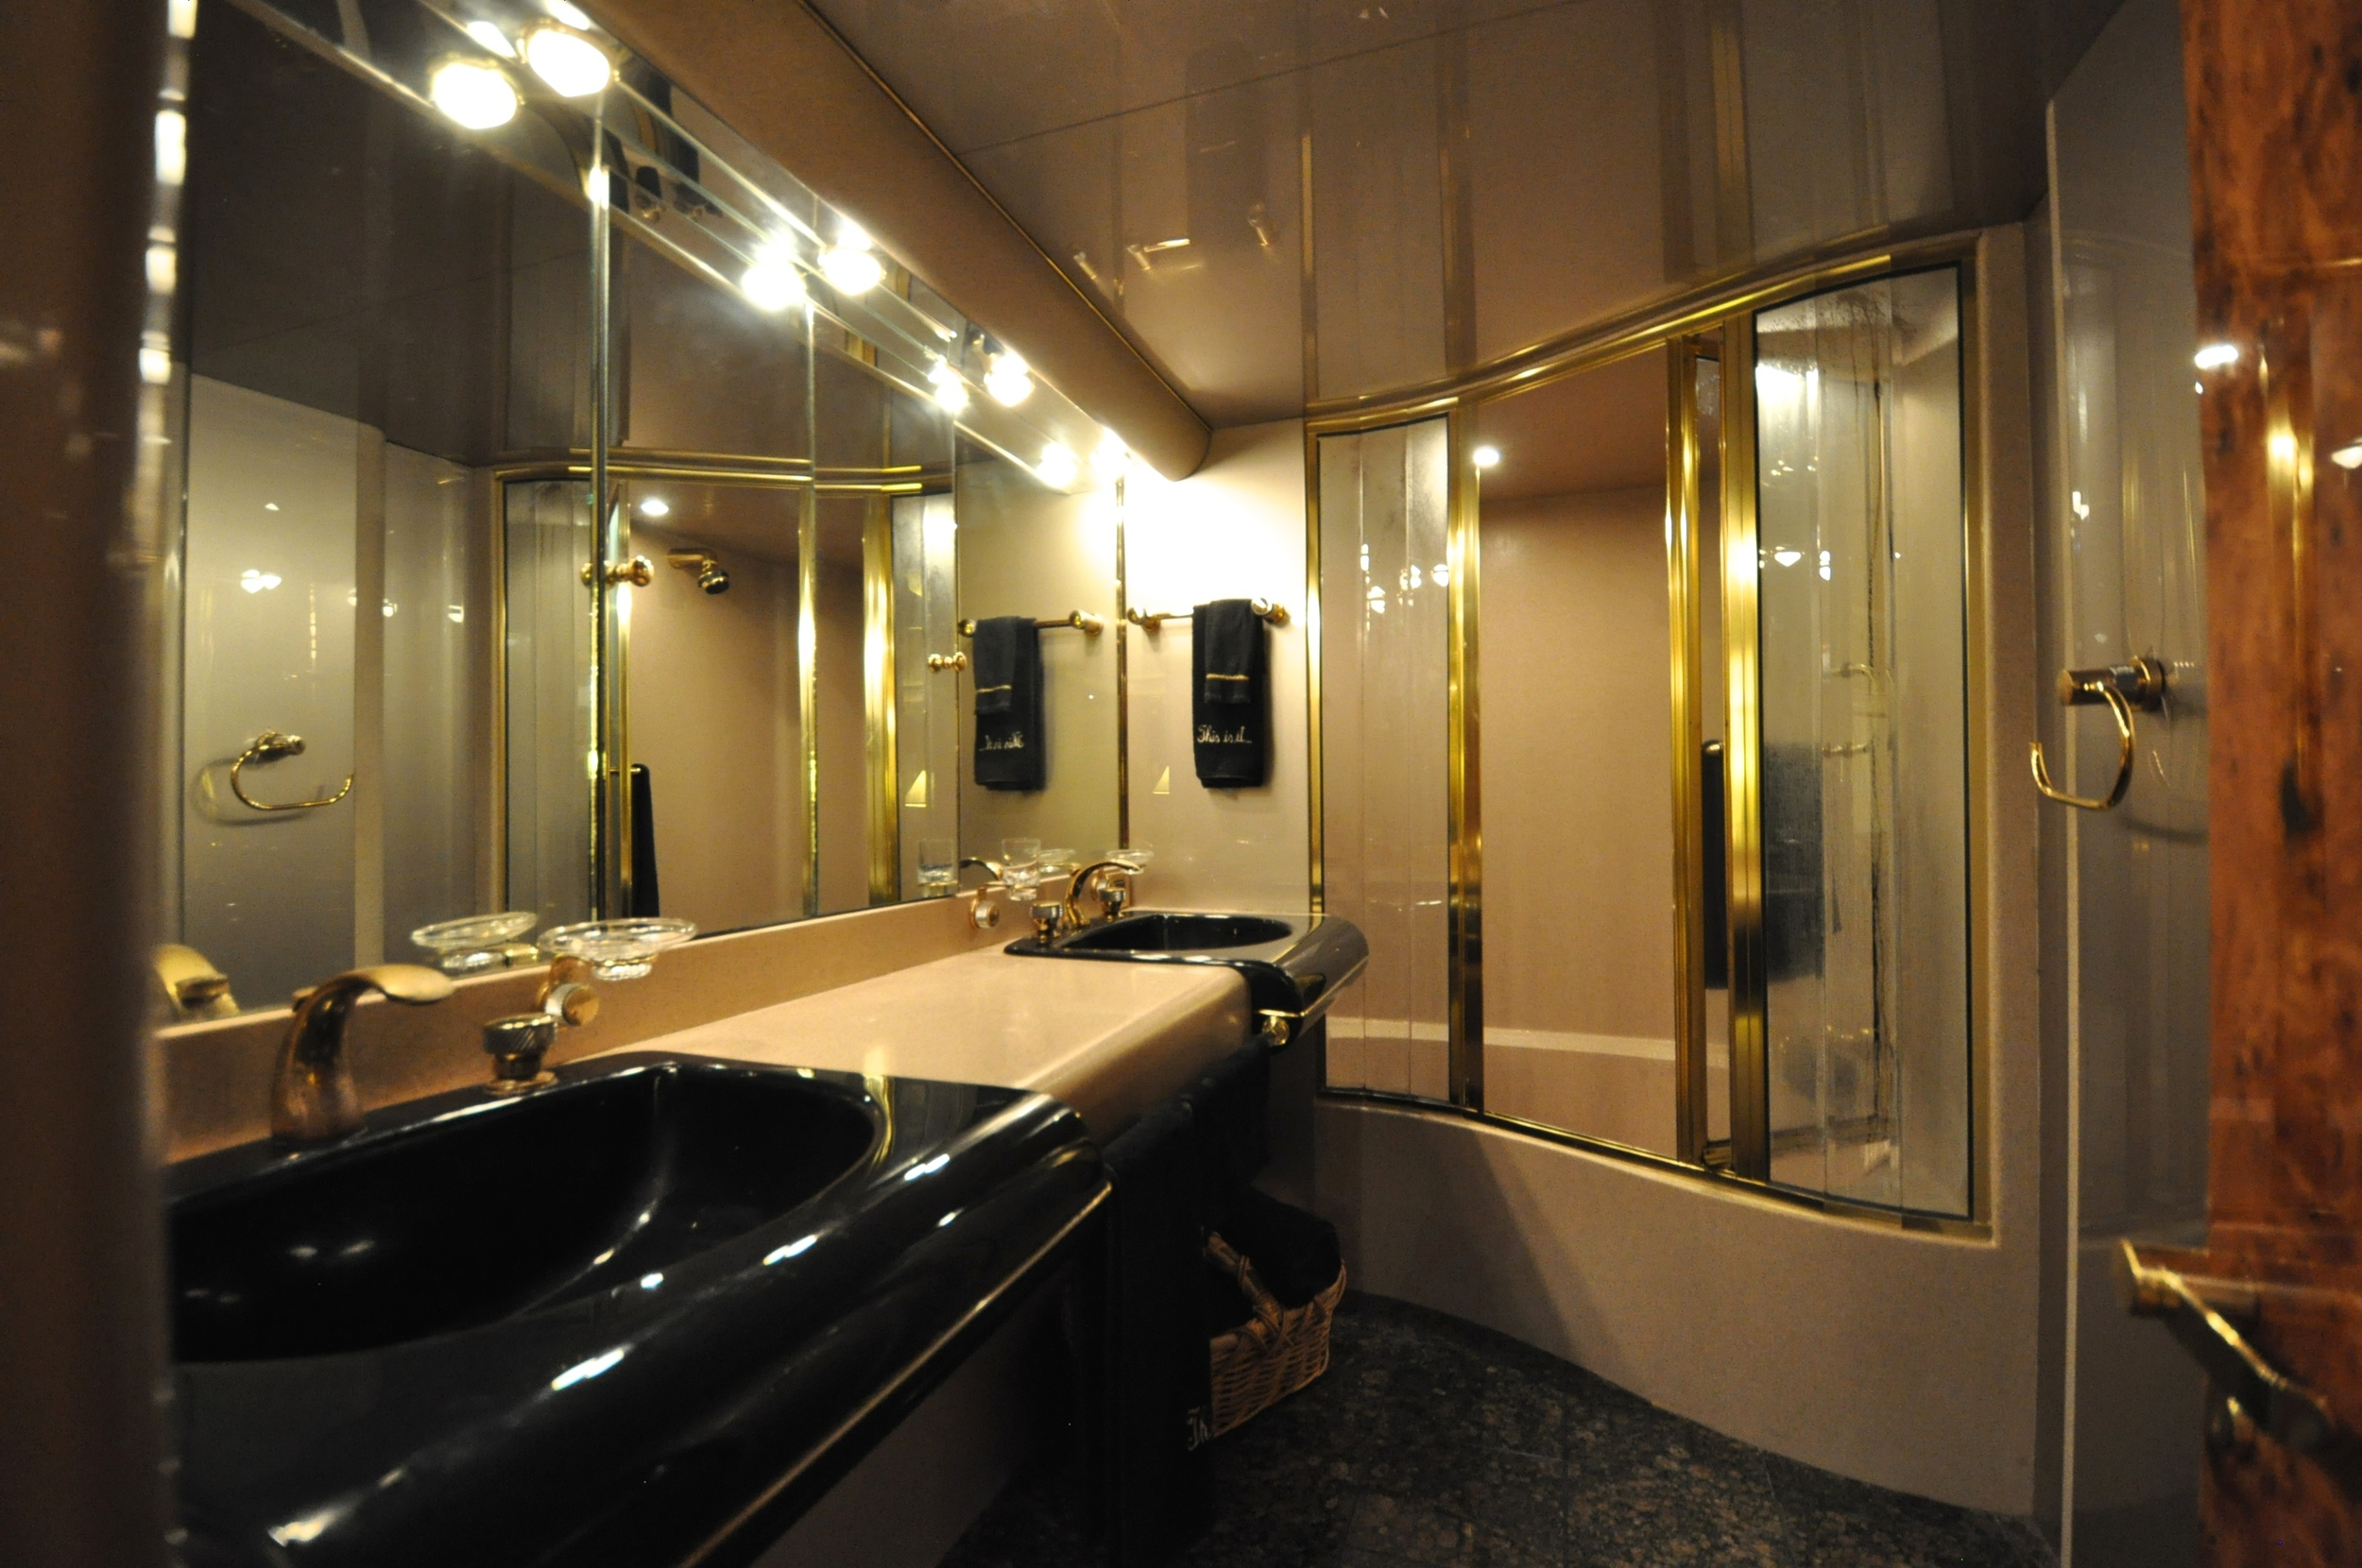 61 - Master suite bath.JPG